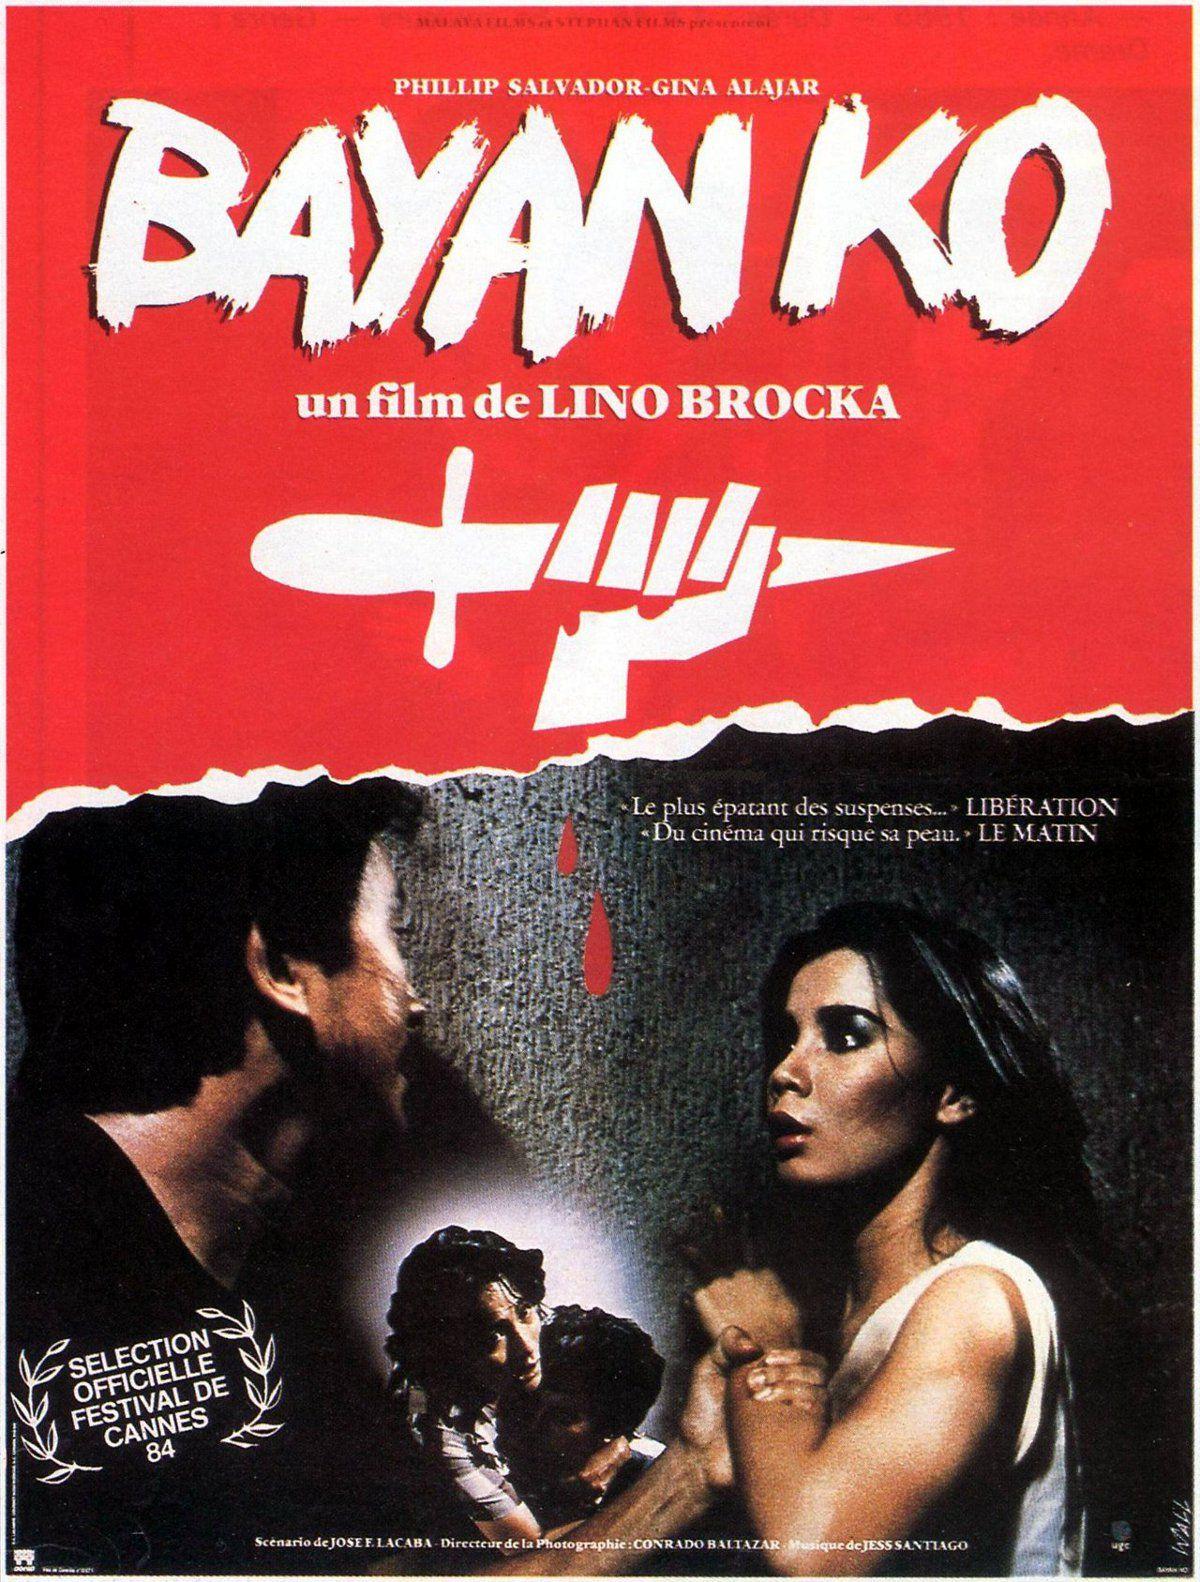 Votre dernier film visionné - Page 15 Bayan_ko